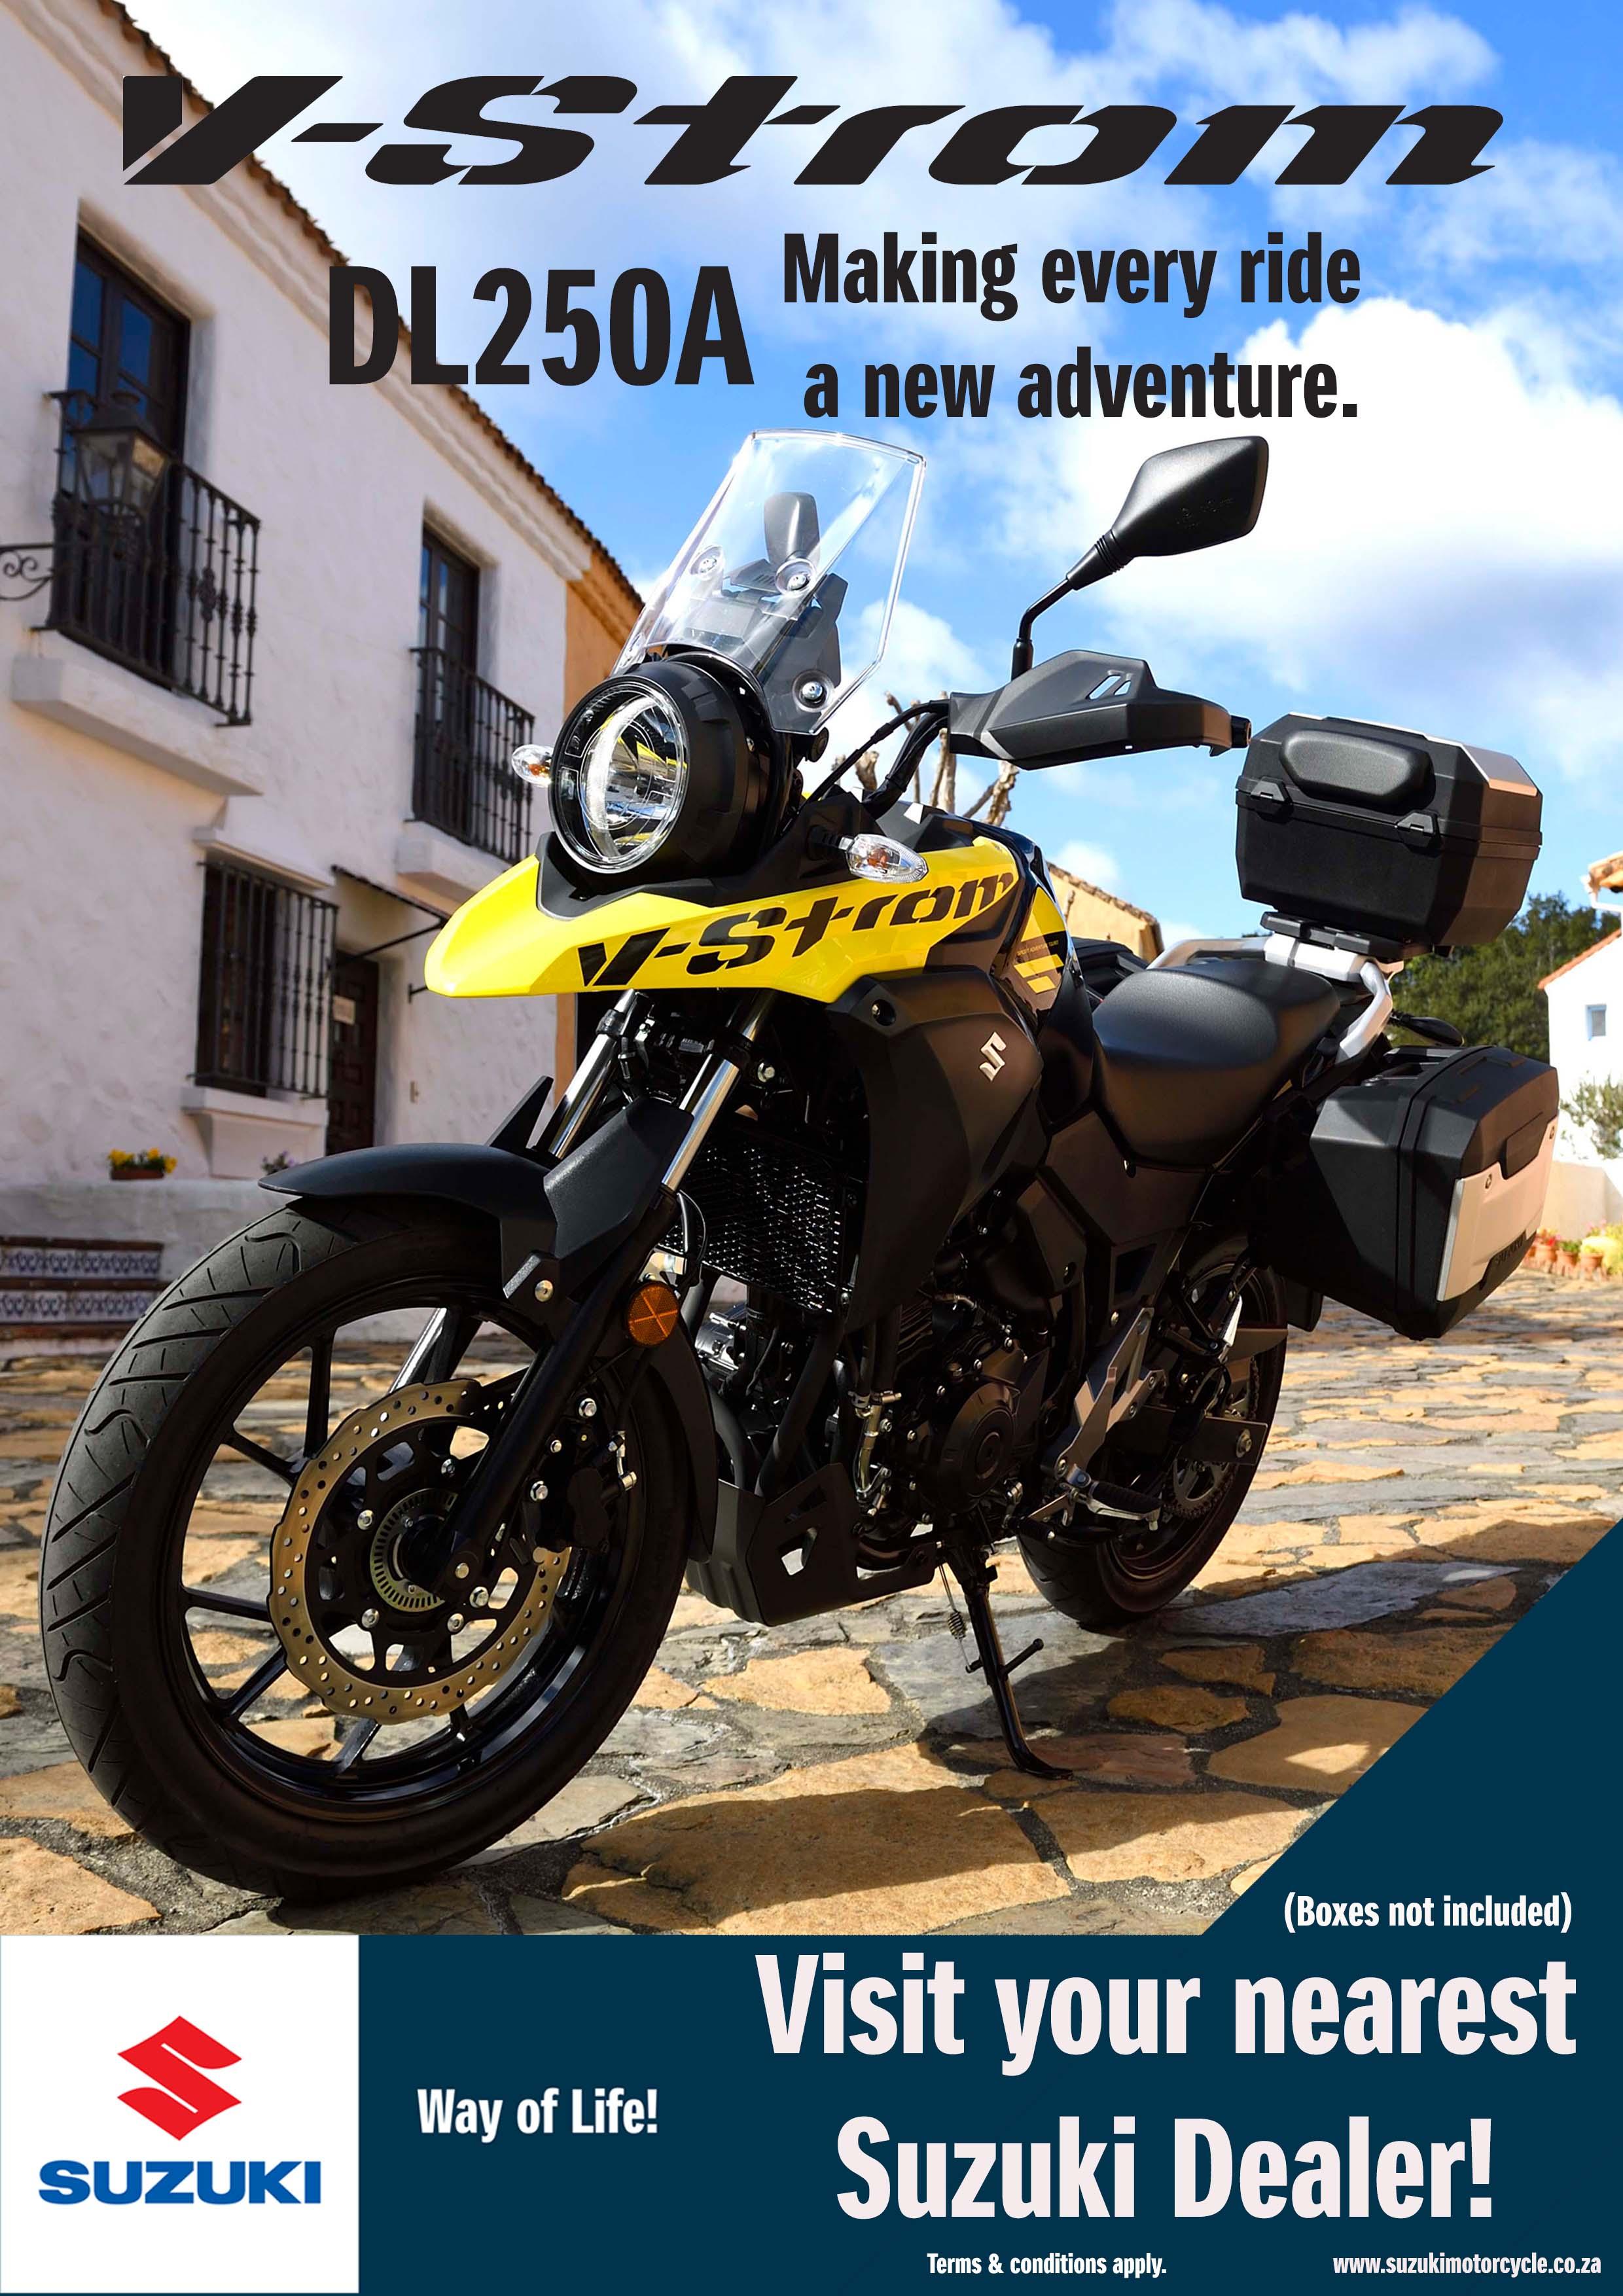 Suzuki DL250A – Making Every Ride a New Adventure